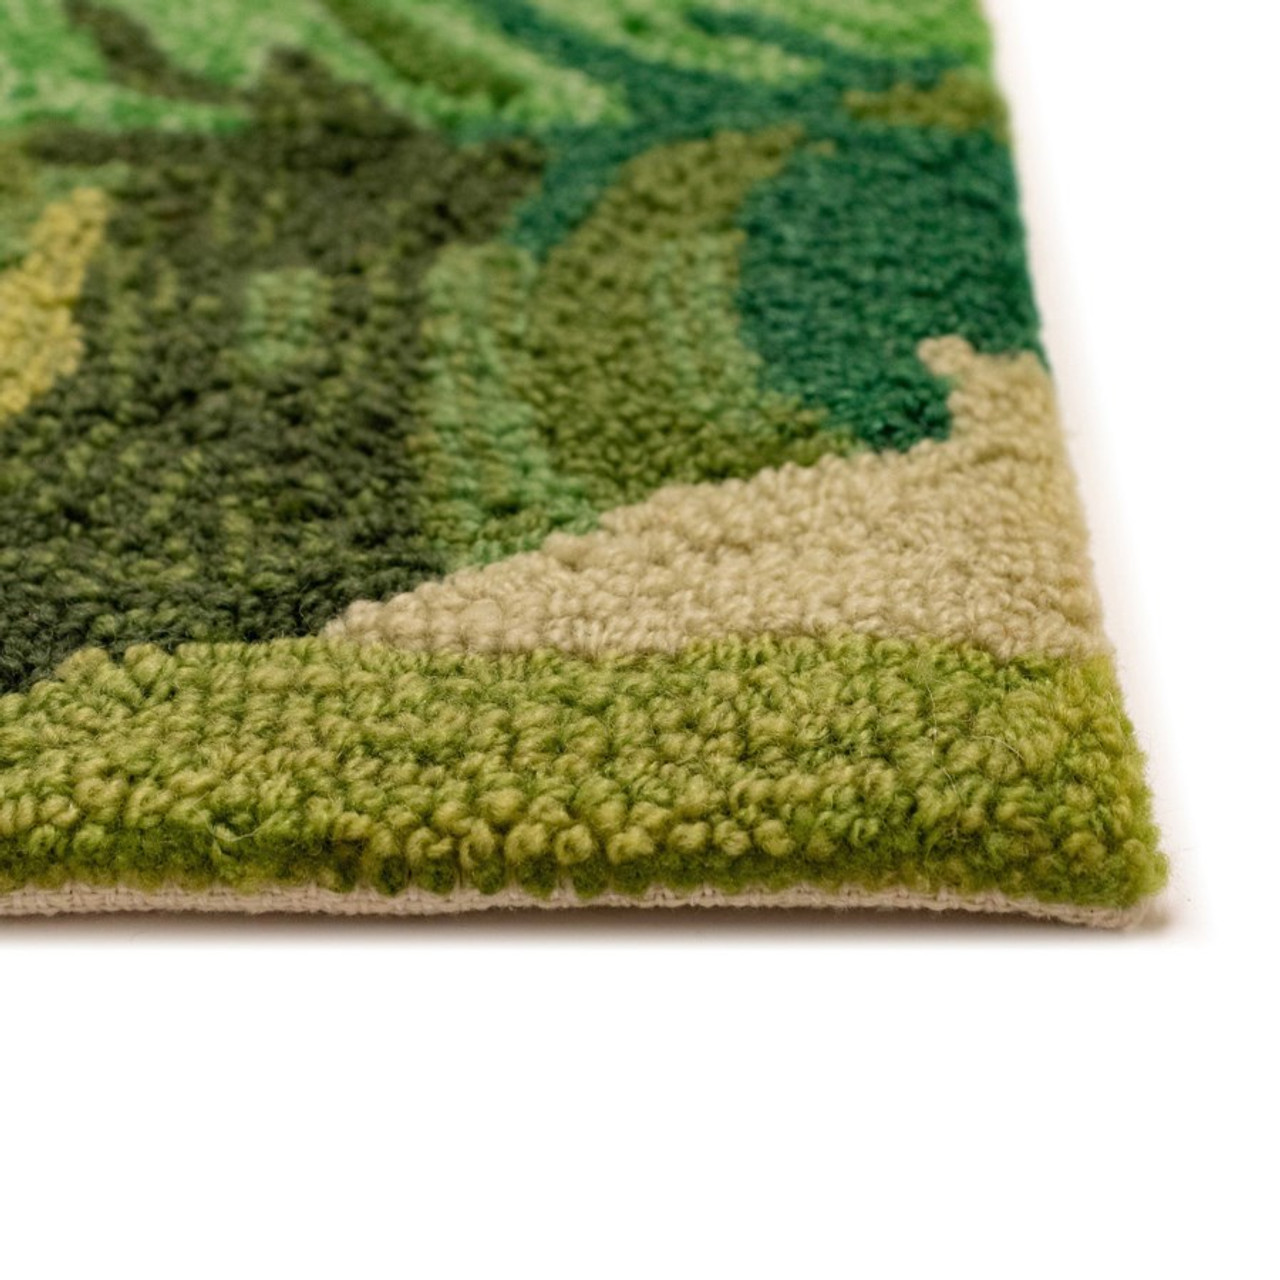 Green Capri Palm Leaf Indoor/Outdoor Rug - Pile